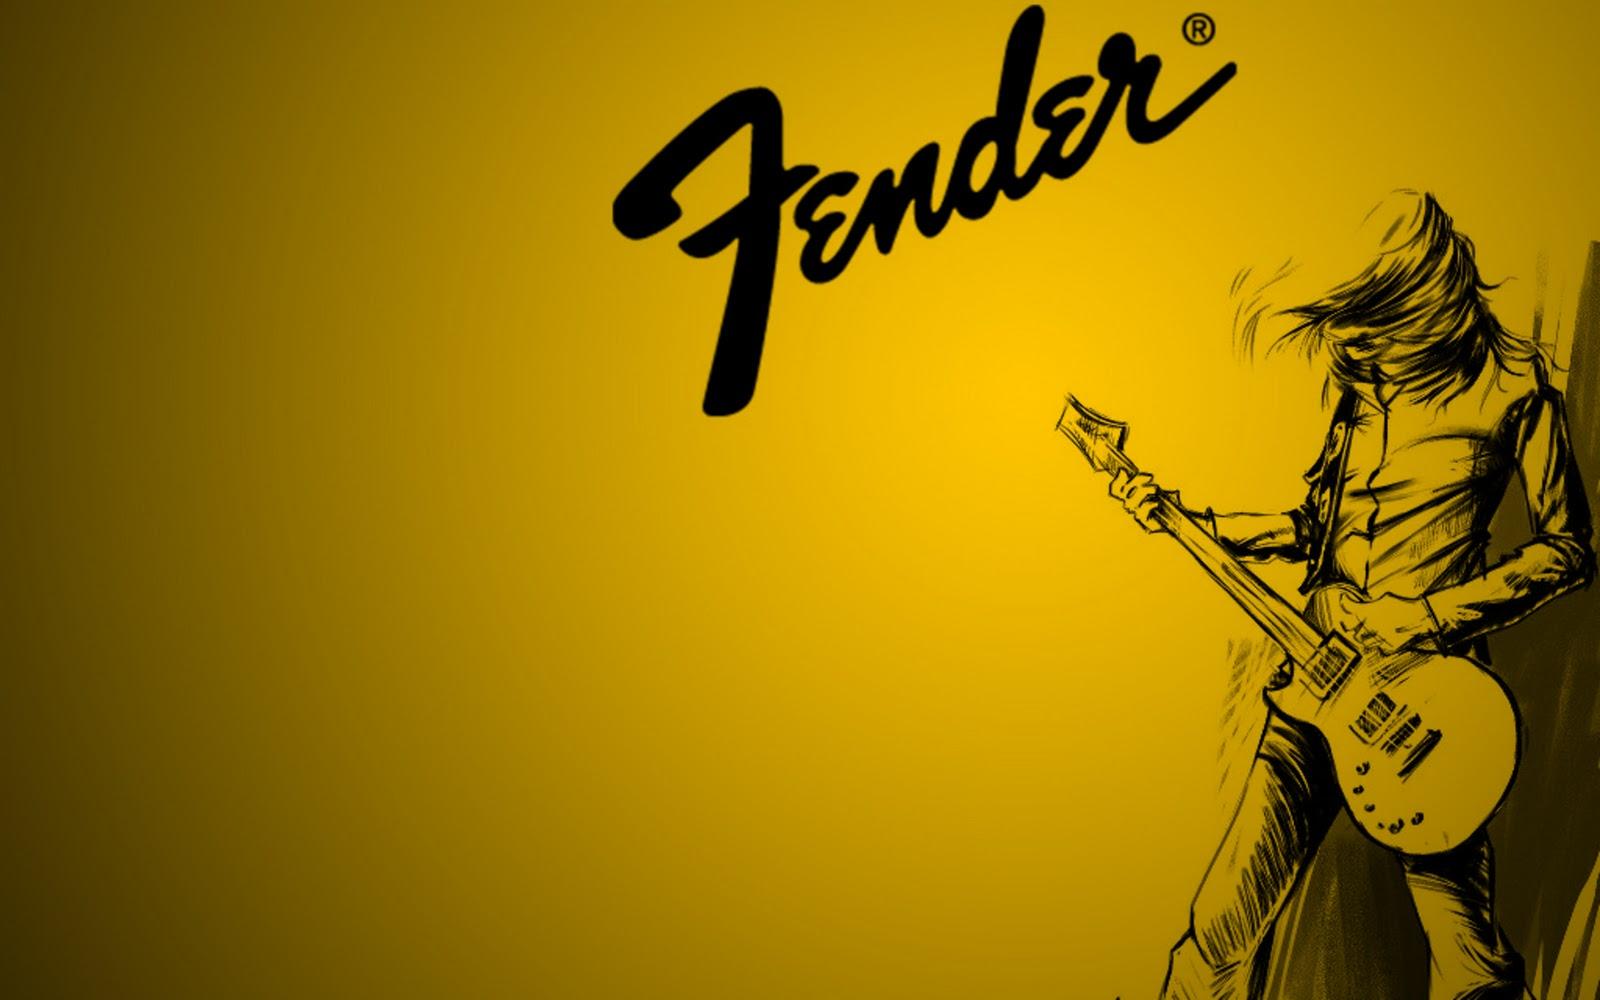 Fender Guitar Wallpapers For Desktop 2482 Hd Wallpapers in Music 1600x1000